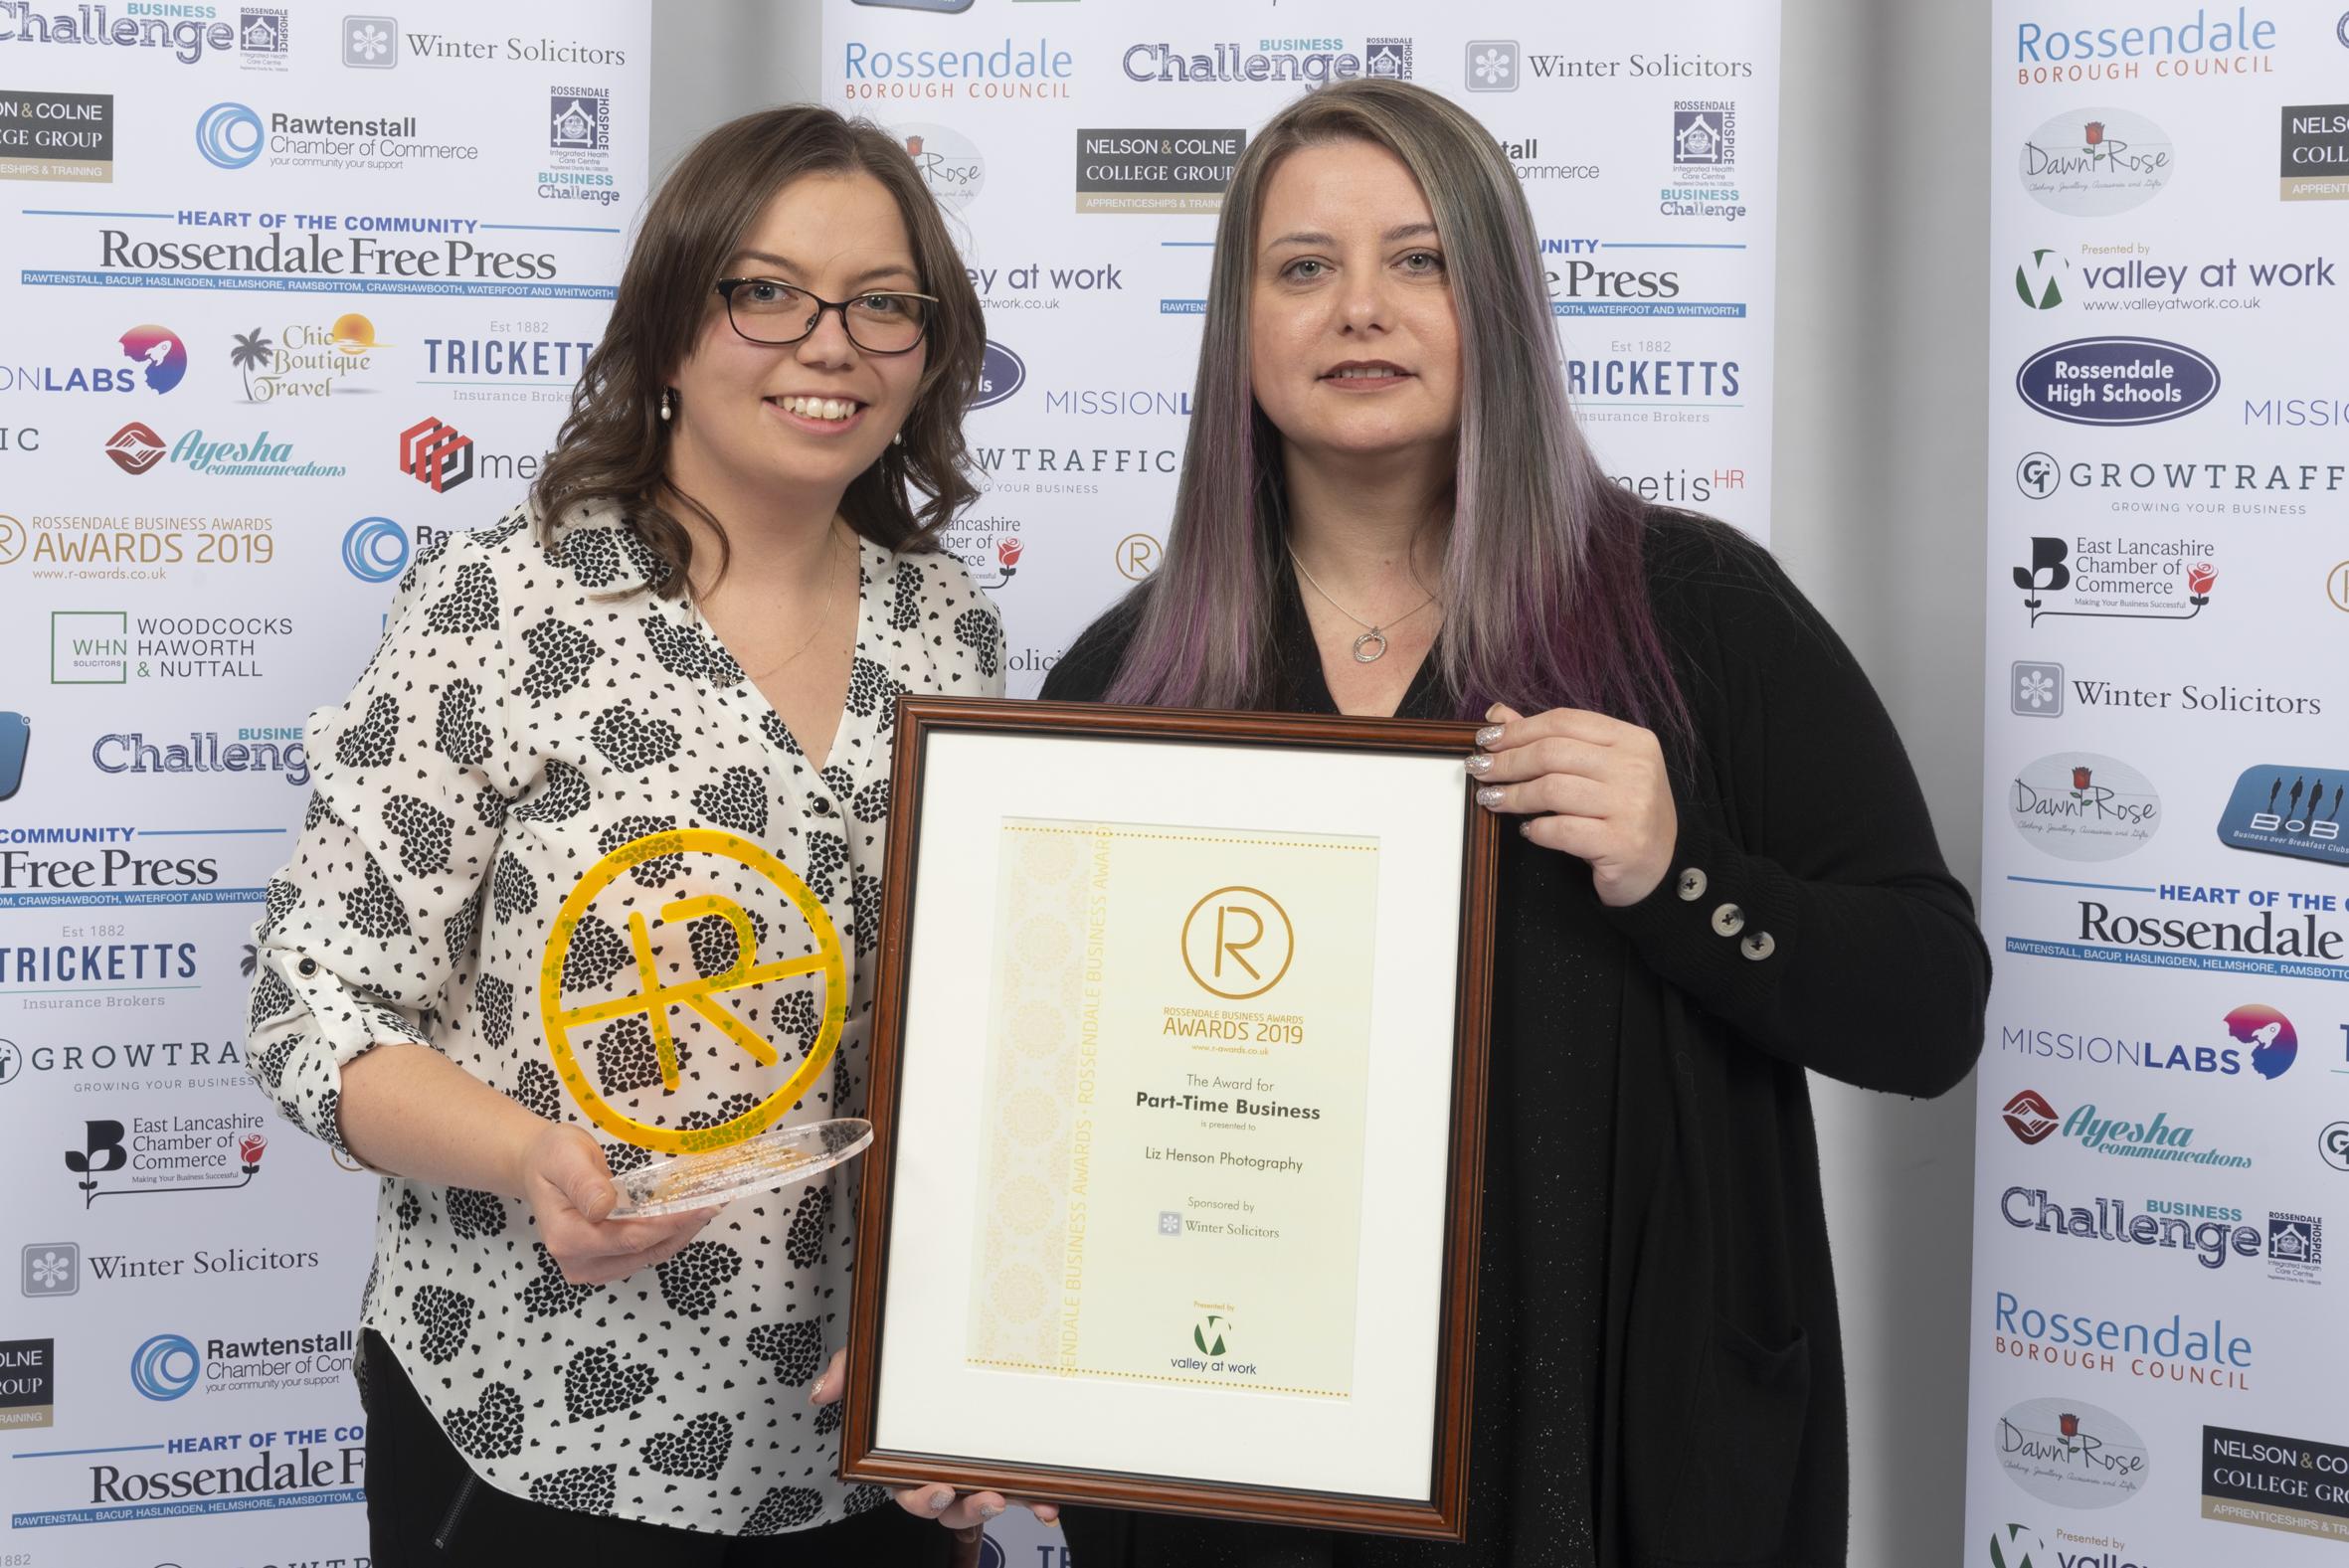 Tenth Anniversary Awards Showcase Rossendale Success